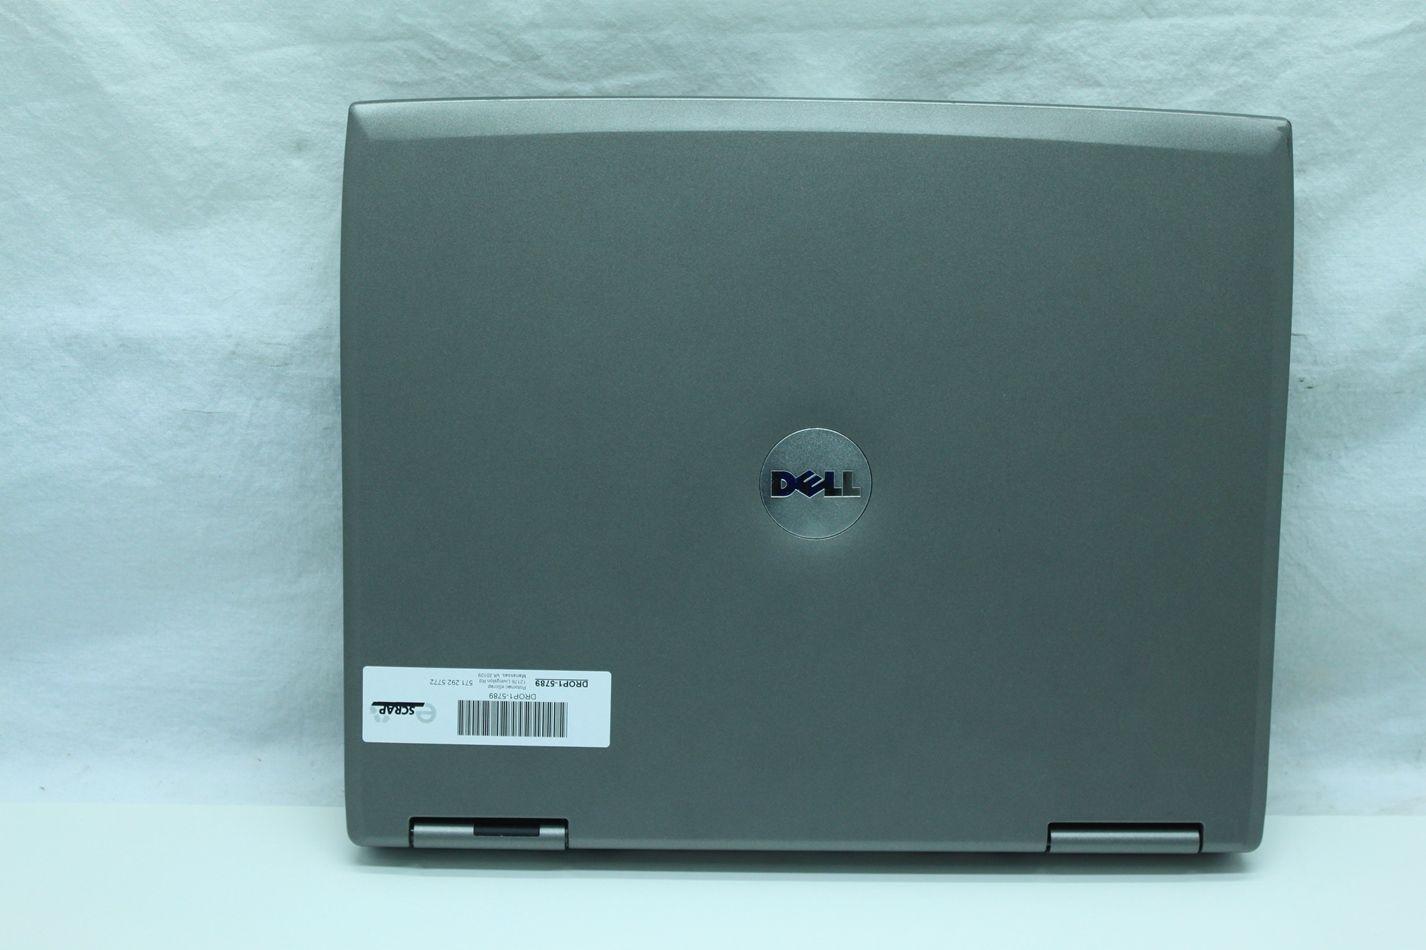 Dell Latitude D505 Laptop Pentium M 1 5GHz 30GB 512MB XP 3 DVD CDRW